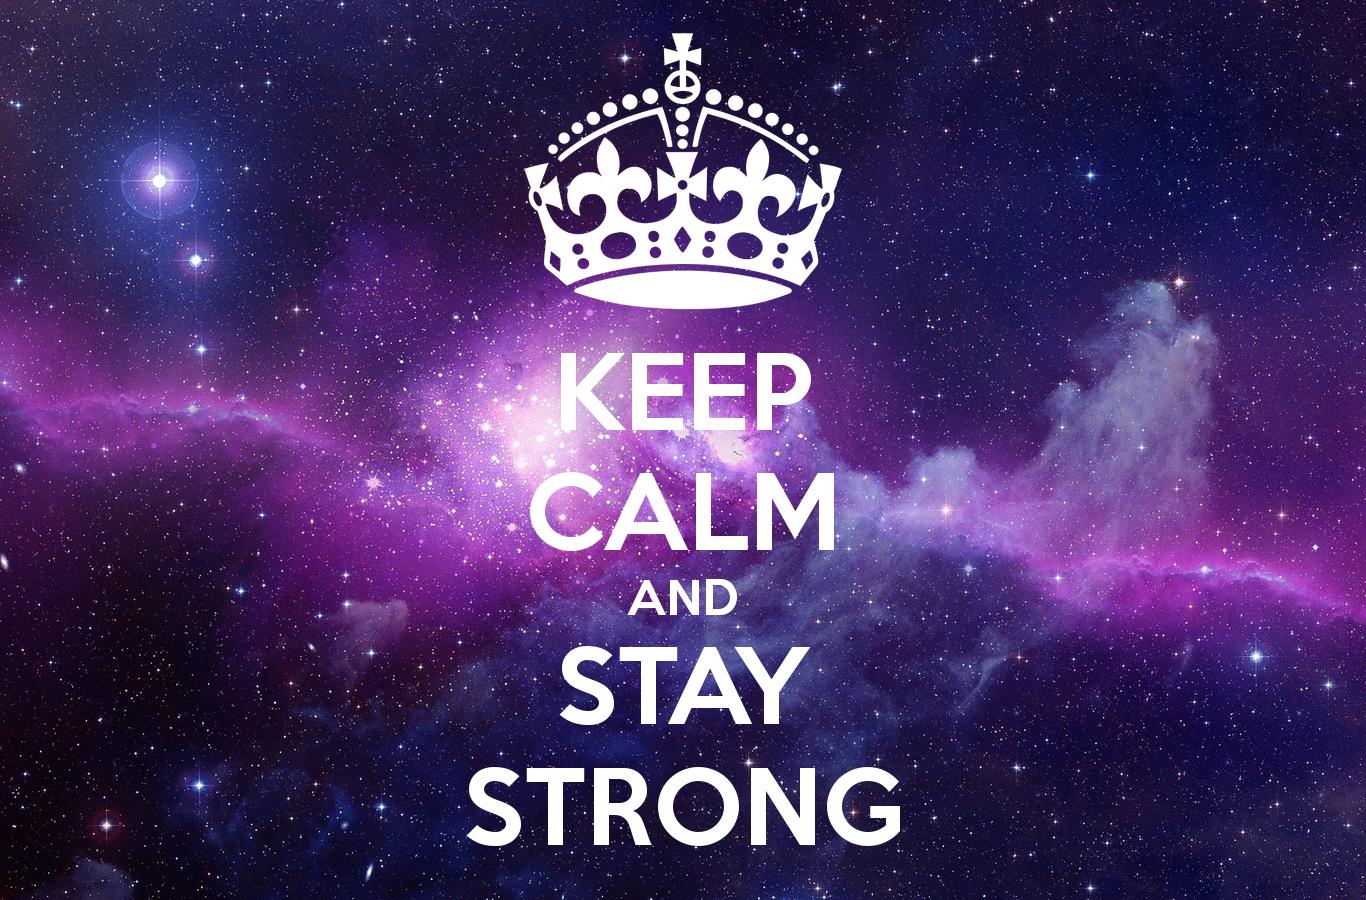 Stay Calm Wallpaper